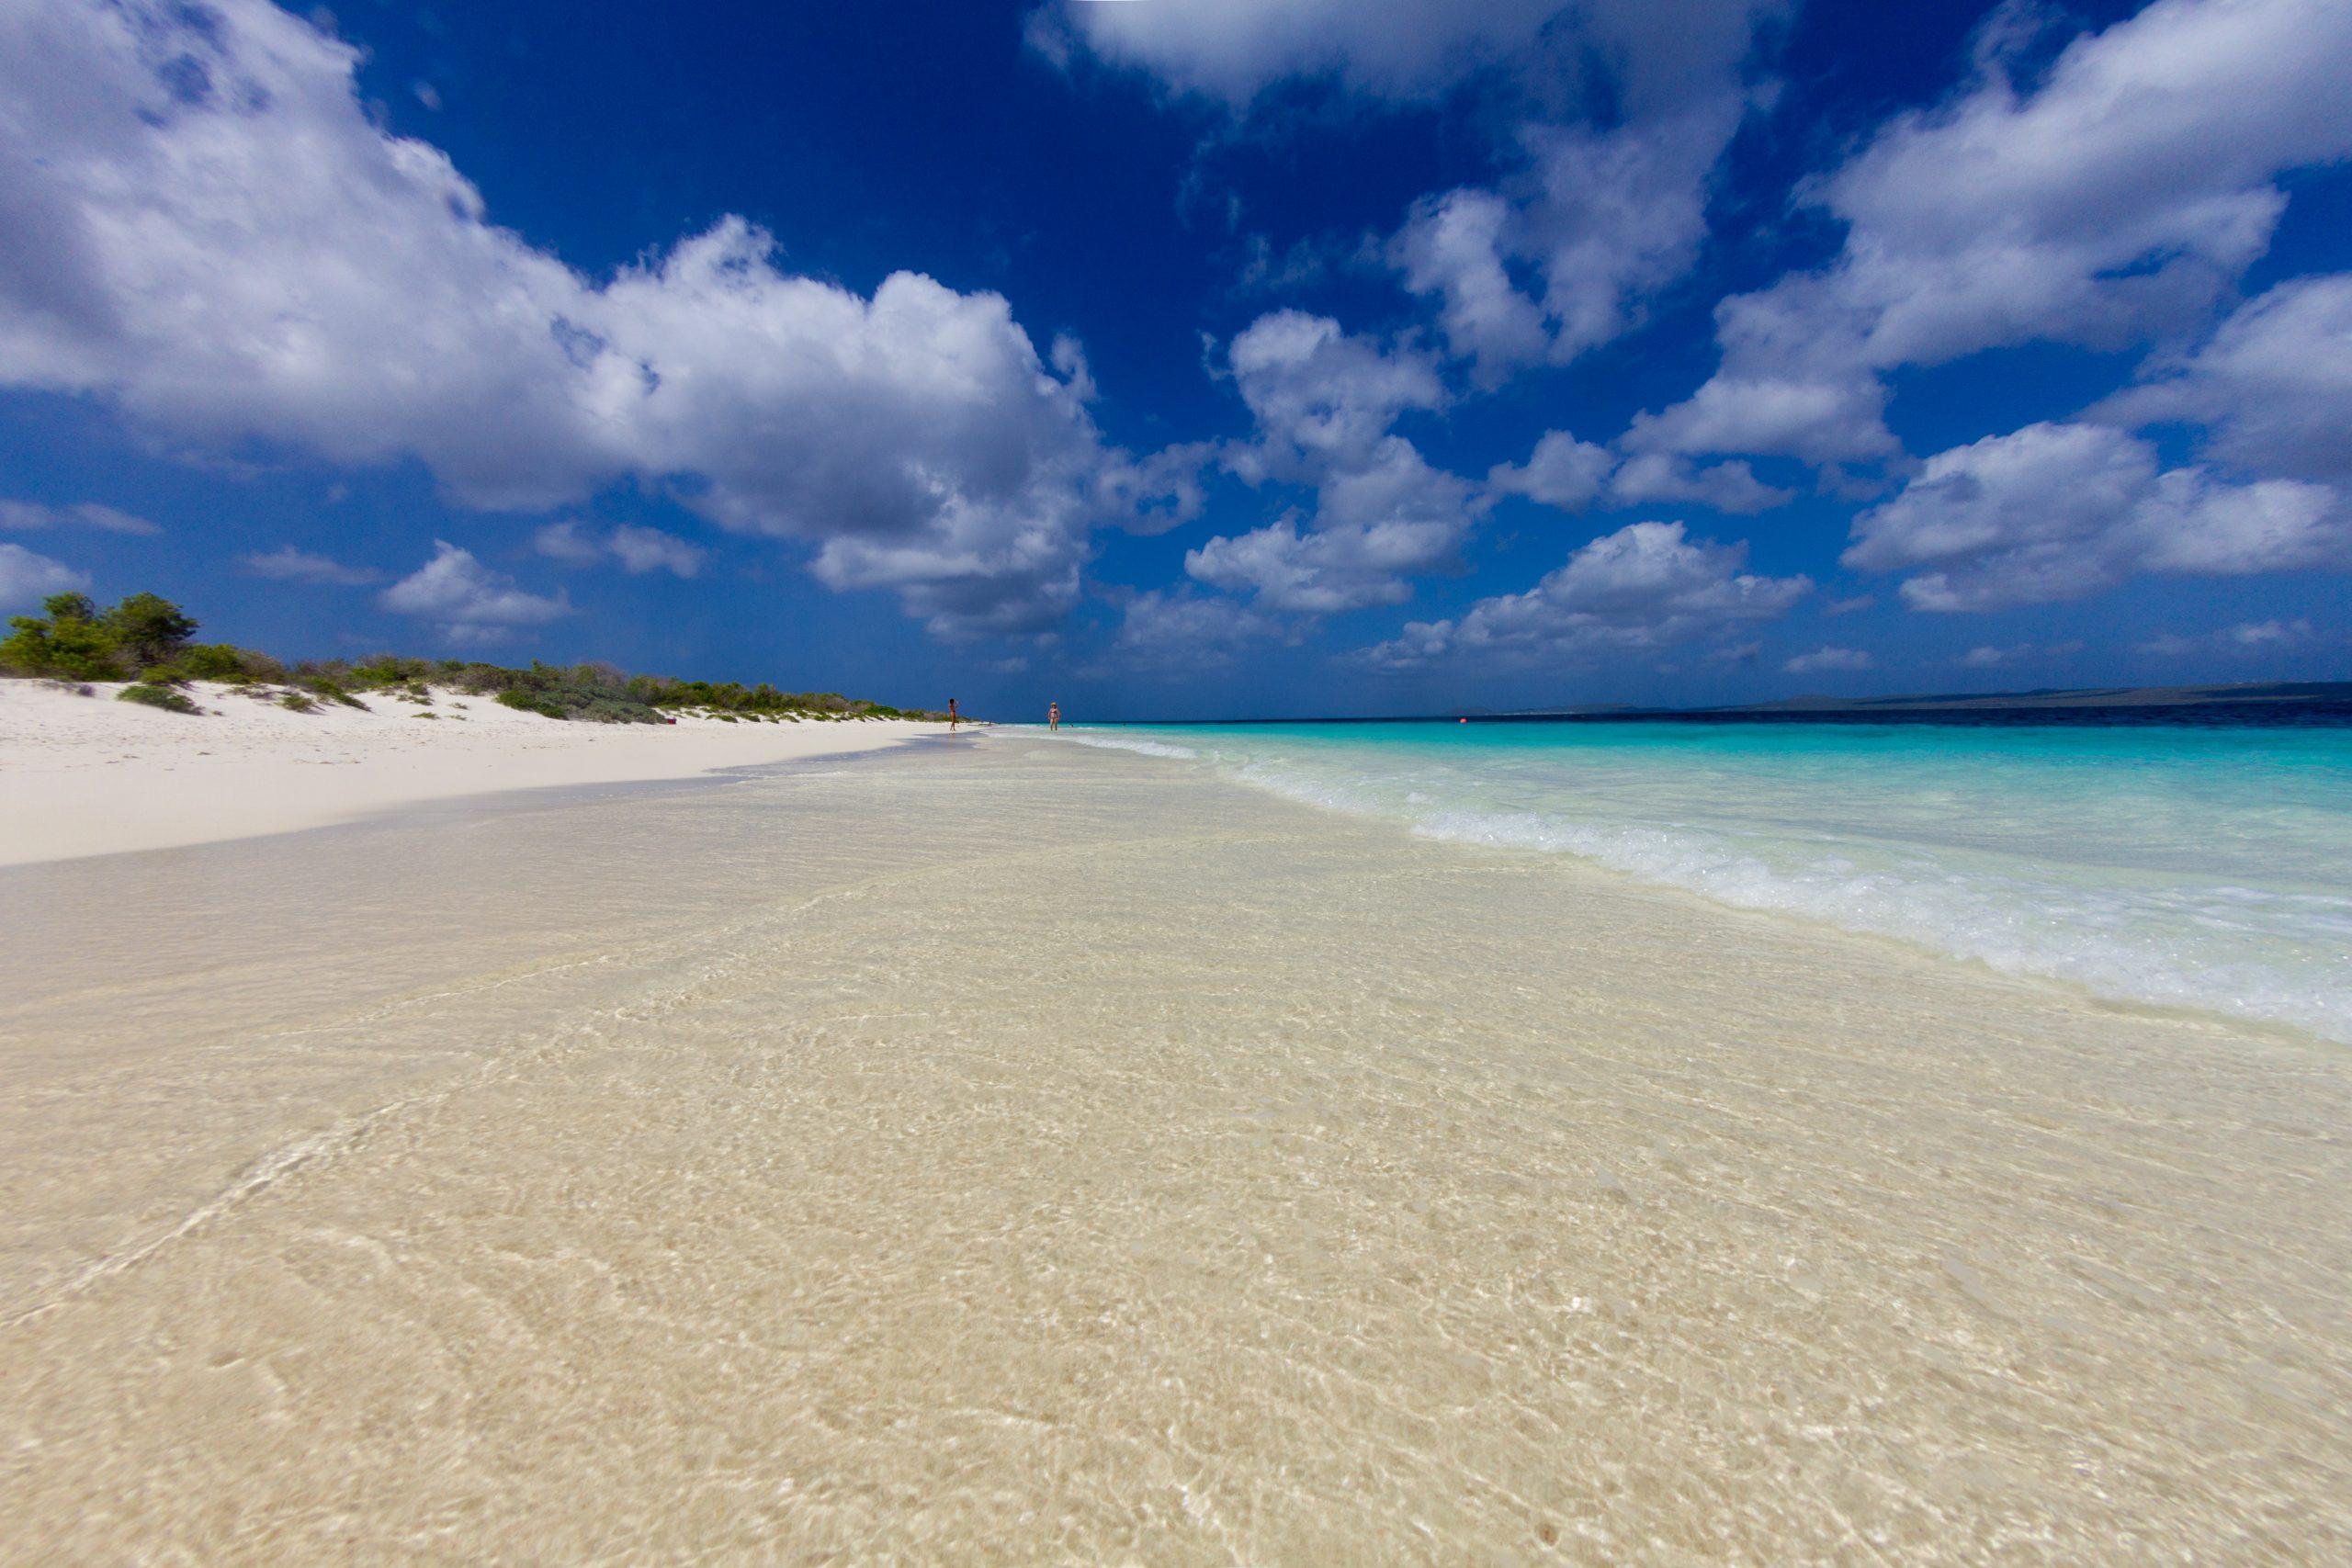 Mooiste stranden Bonaire - No Name Beach